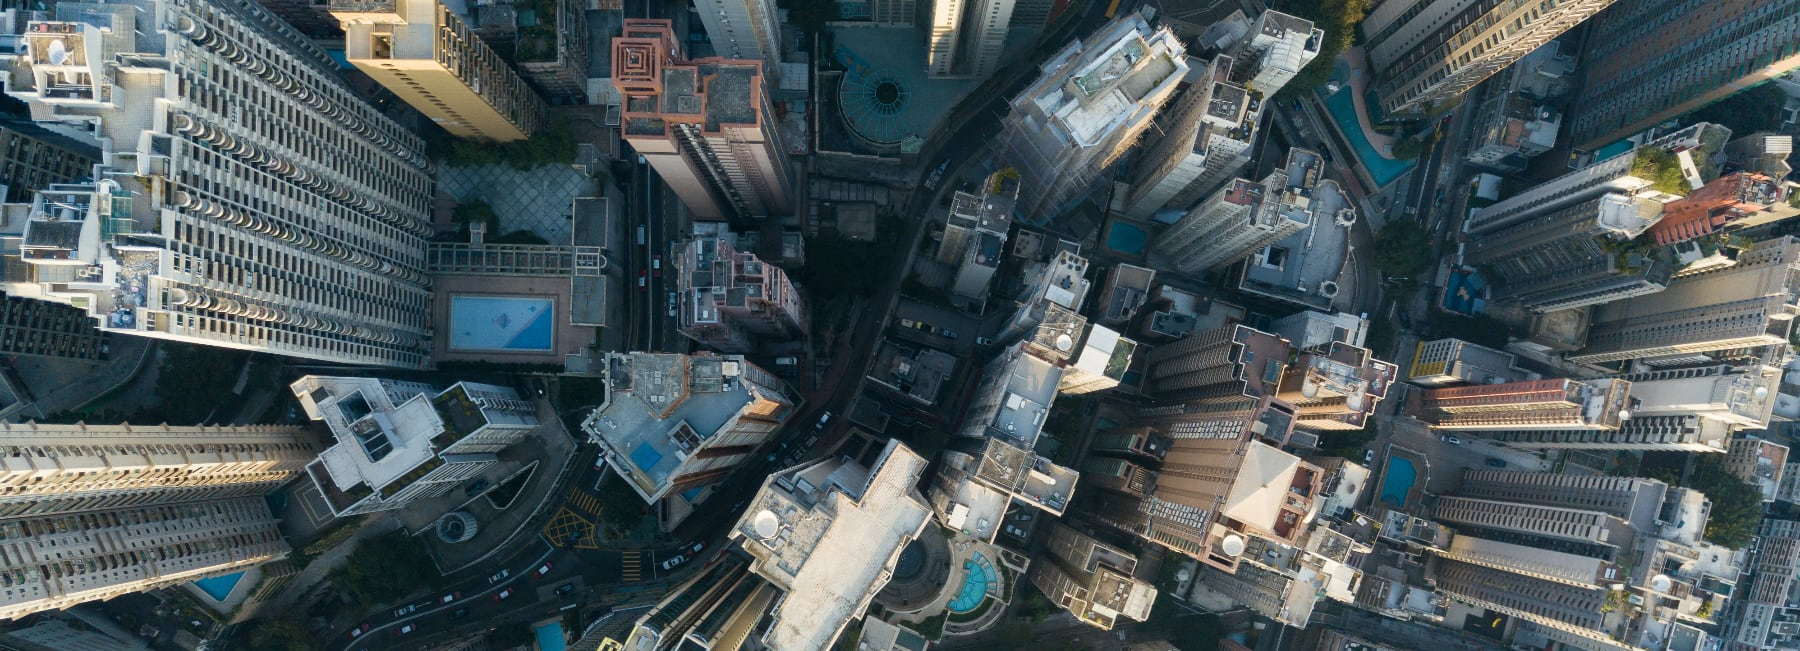 Storstad med skyskrapor fotad fran helikopter